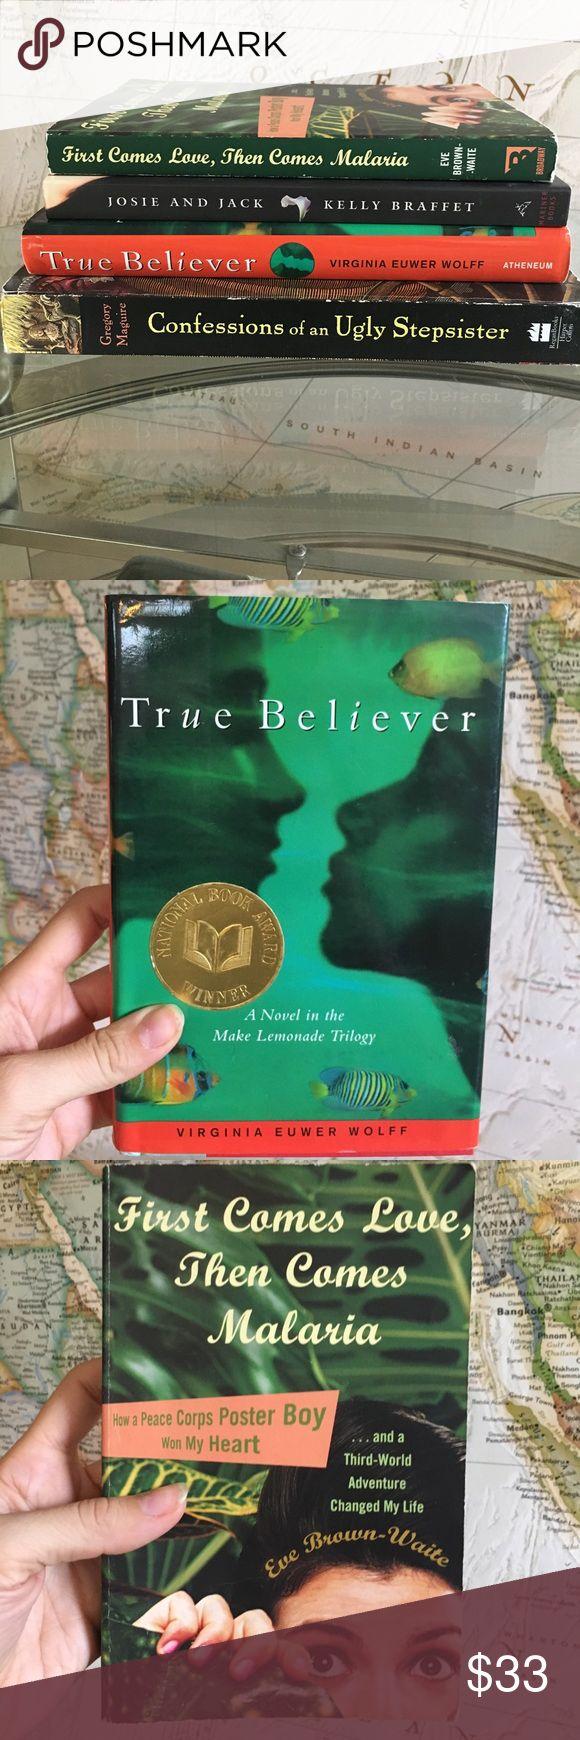 4 Young Adult Fiction Book Bundle (hard&paperback)